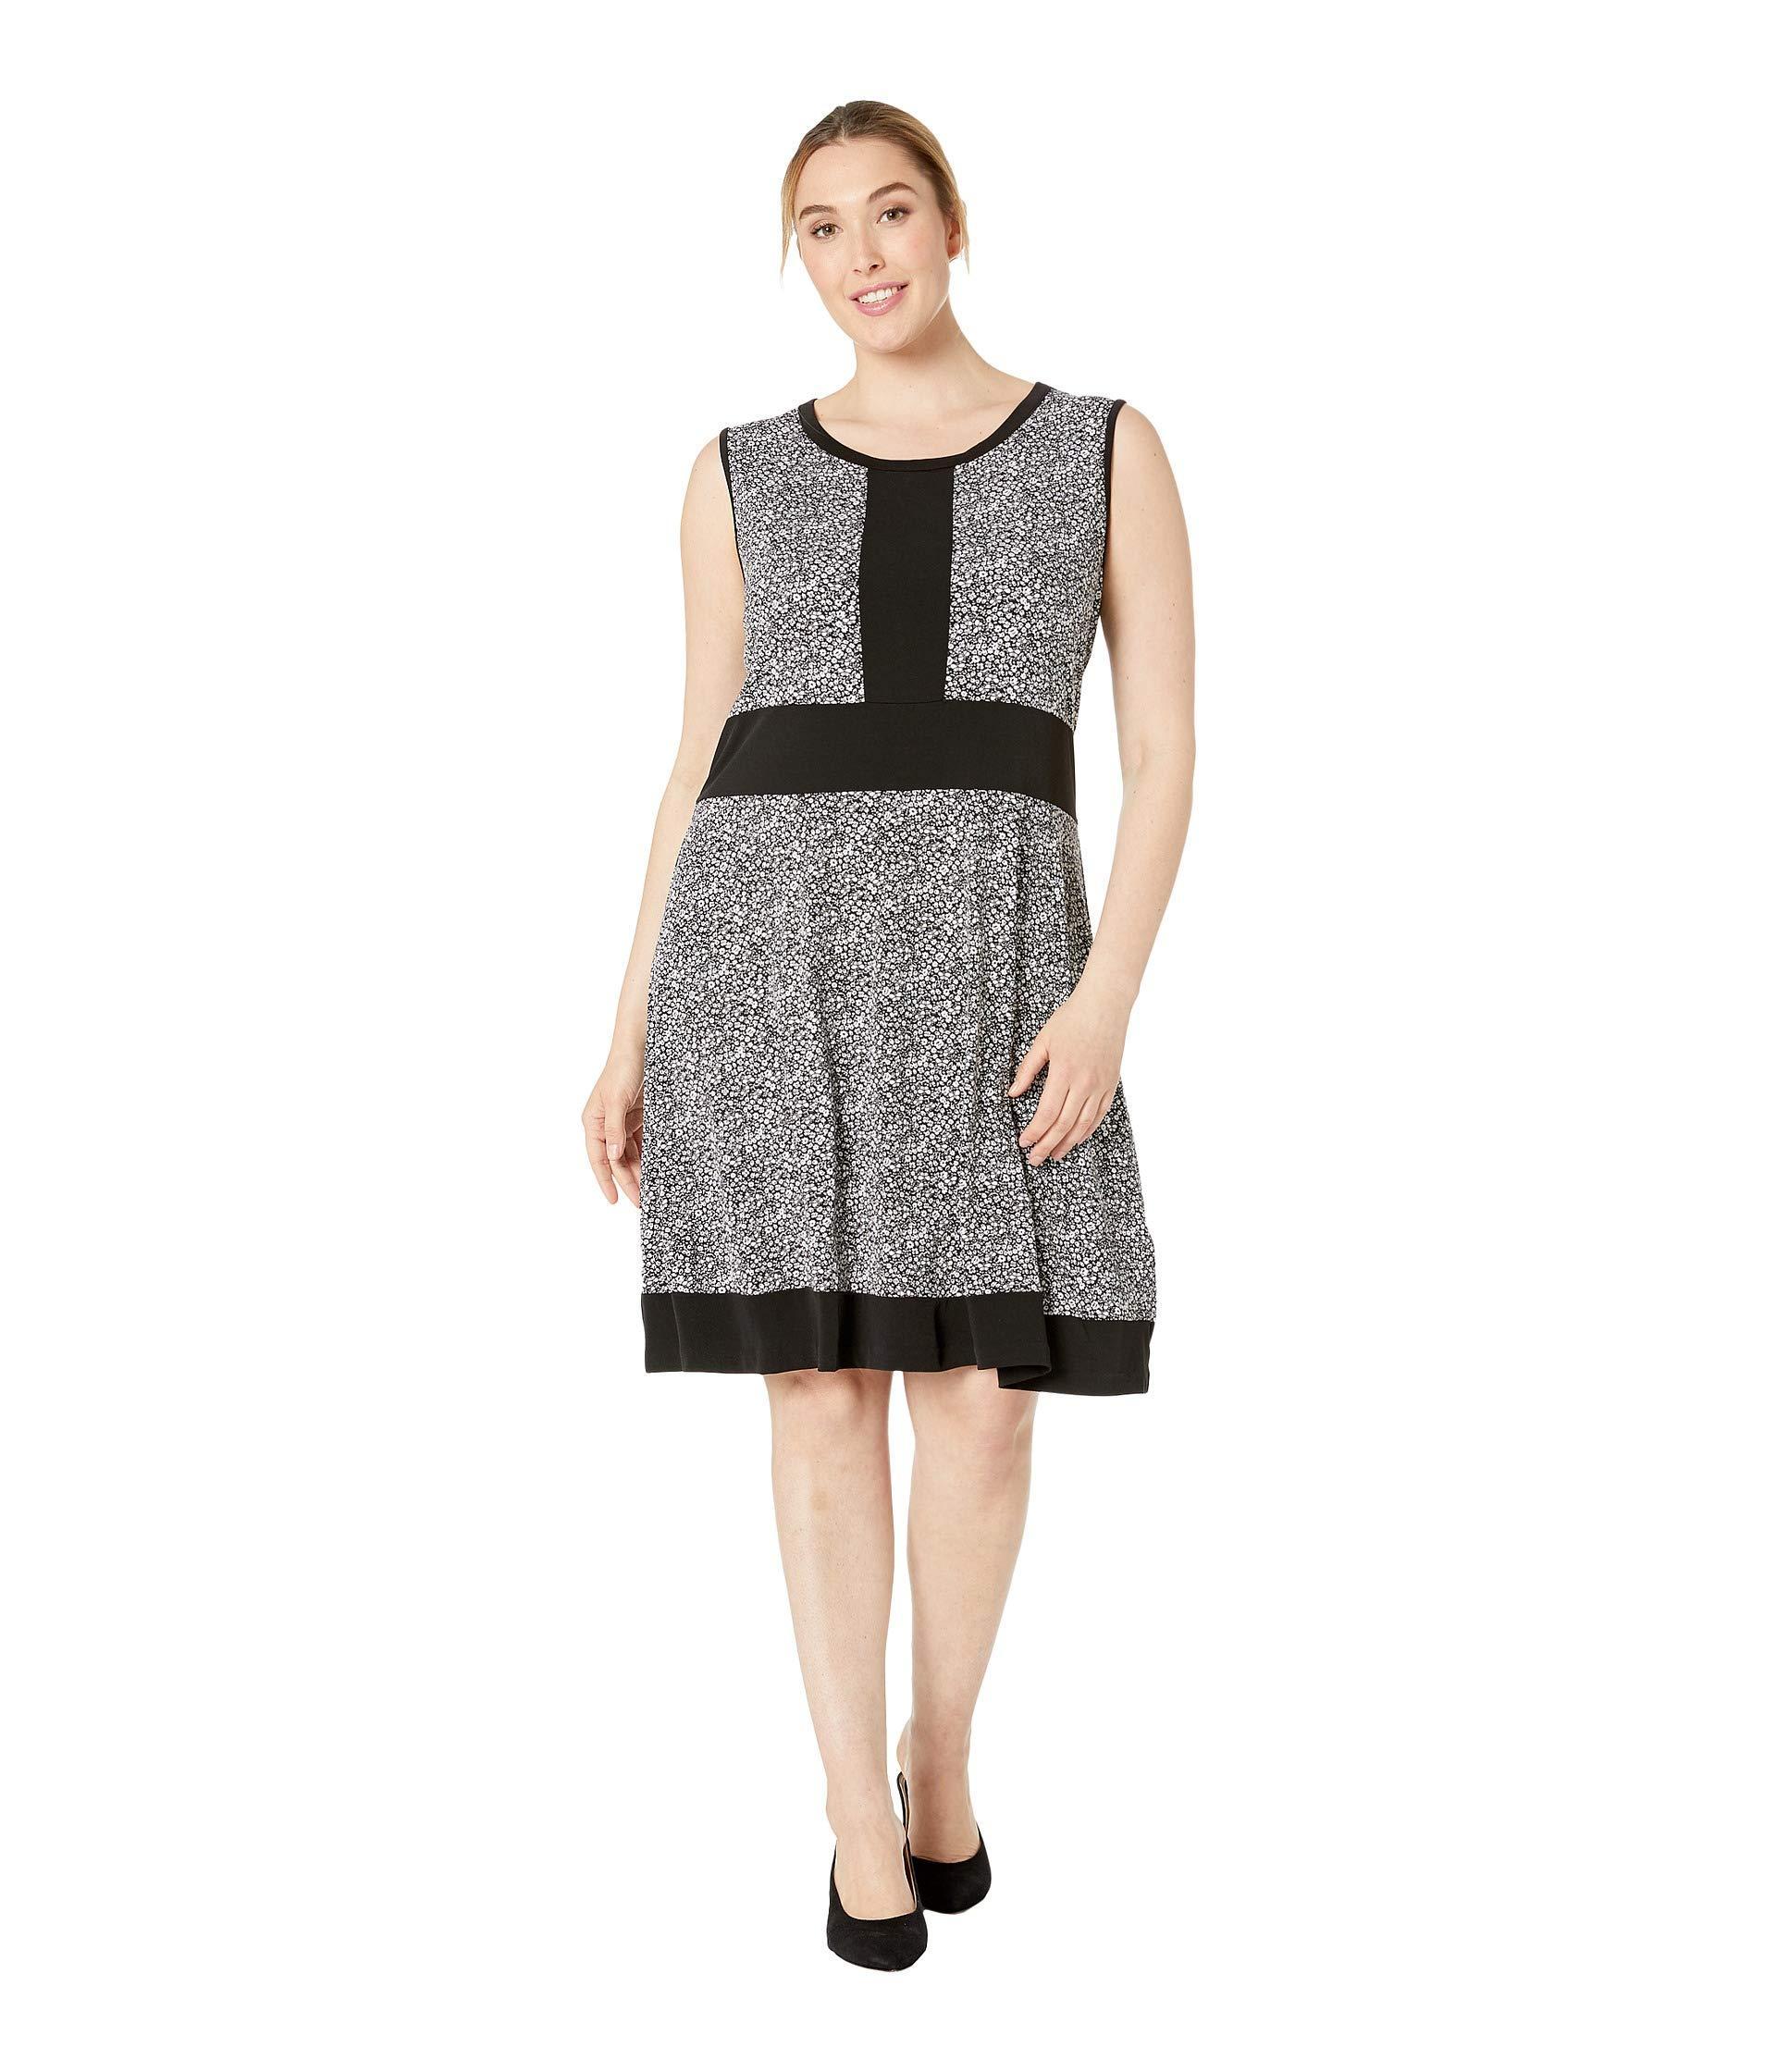 5a024ef872ebf Lyst - MICHAEL Michael Kors Plus Size Spring Sleeveless Border Dress ...